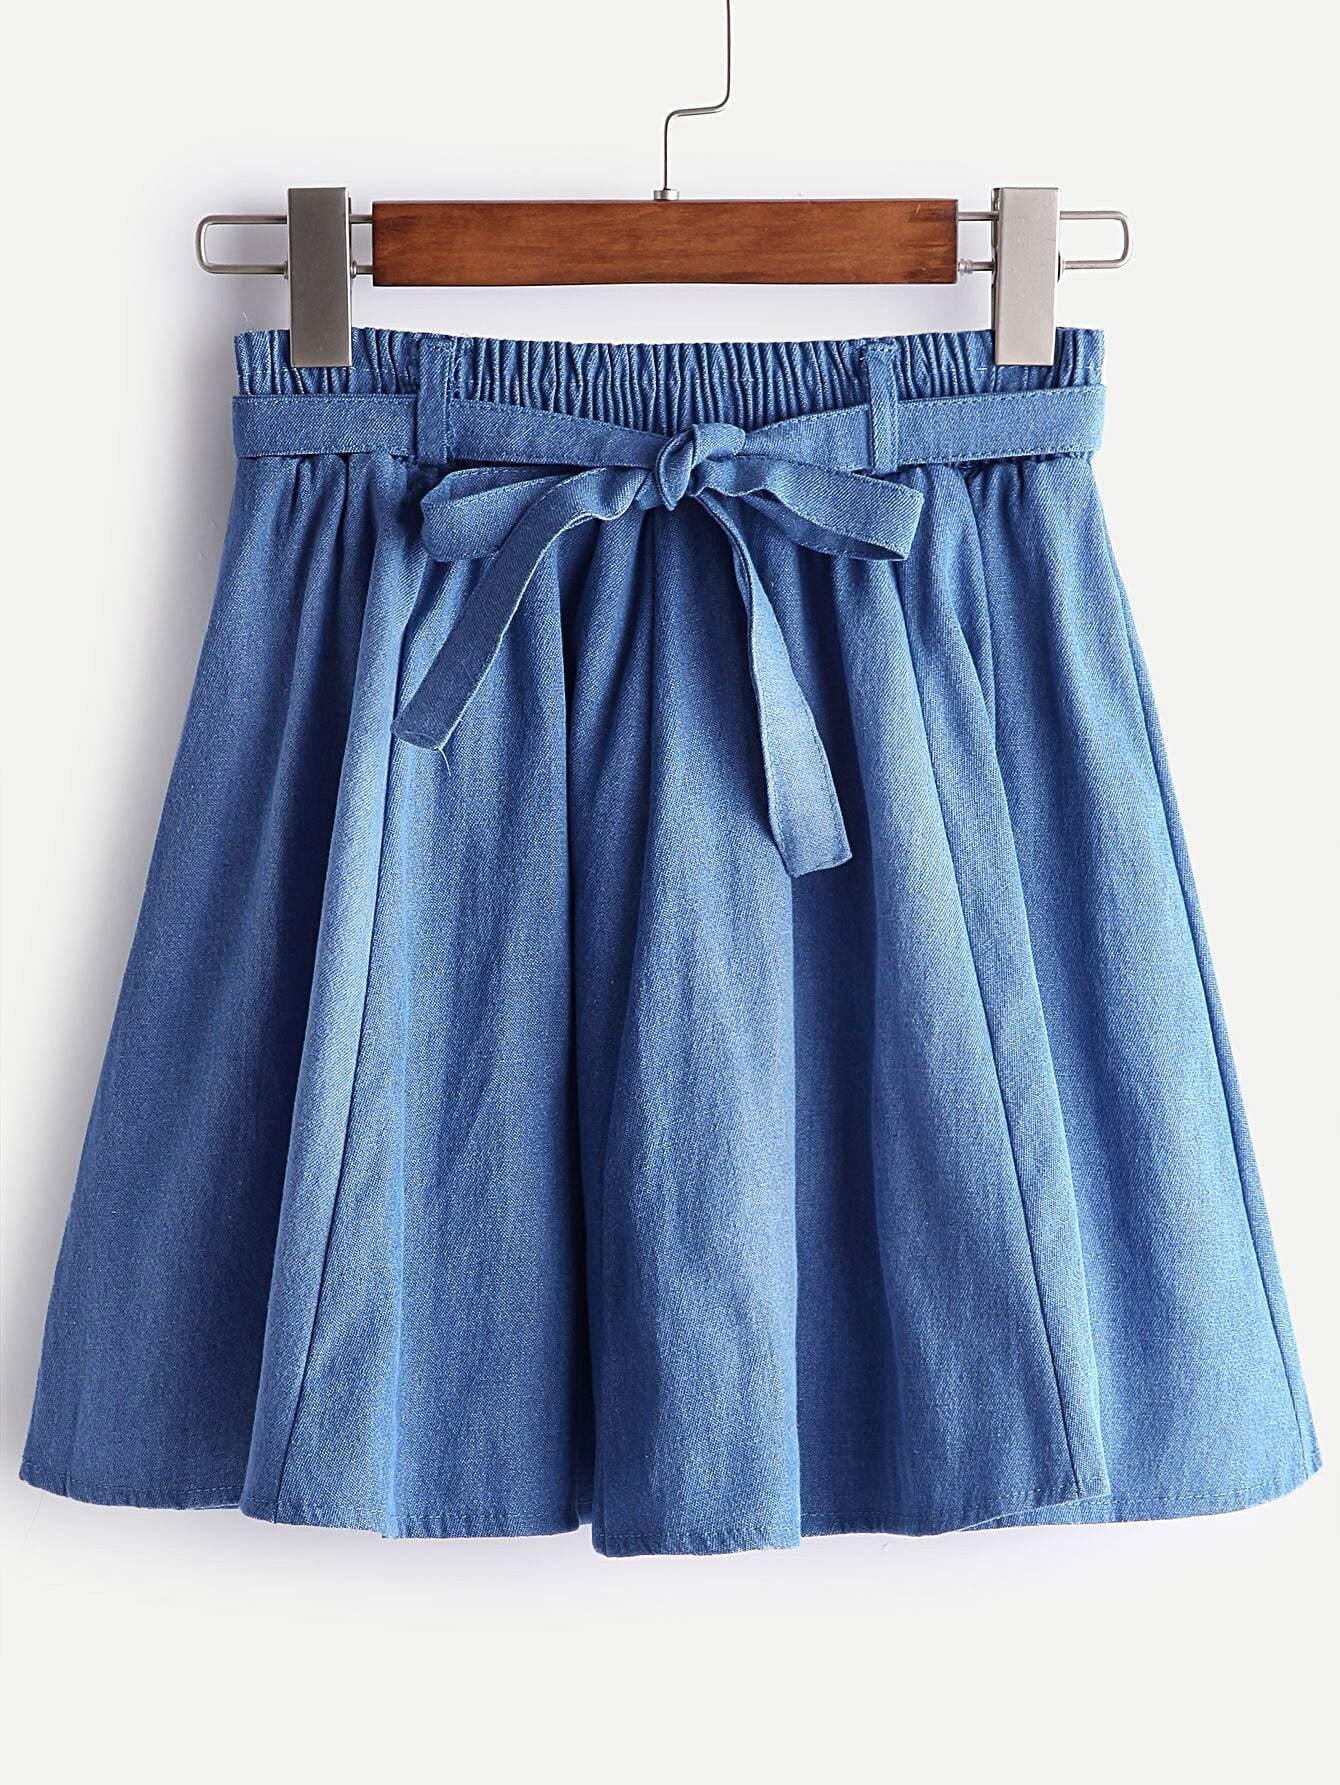 Dark Blue Bow Tie Pleated Denim Skirt